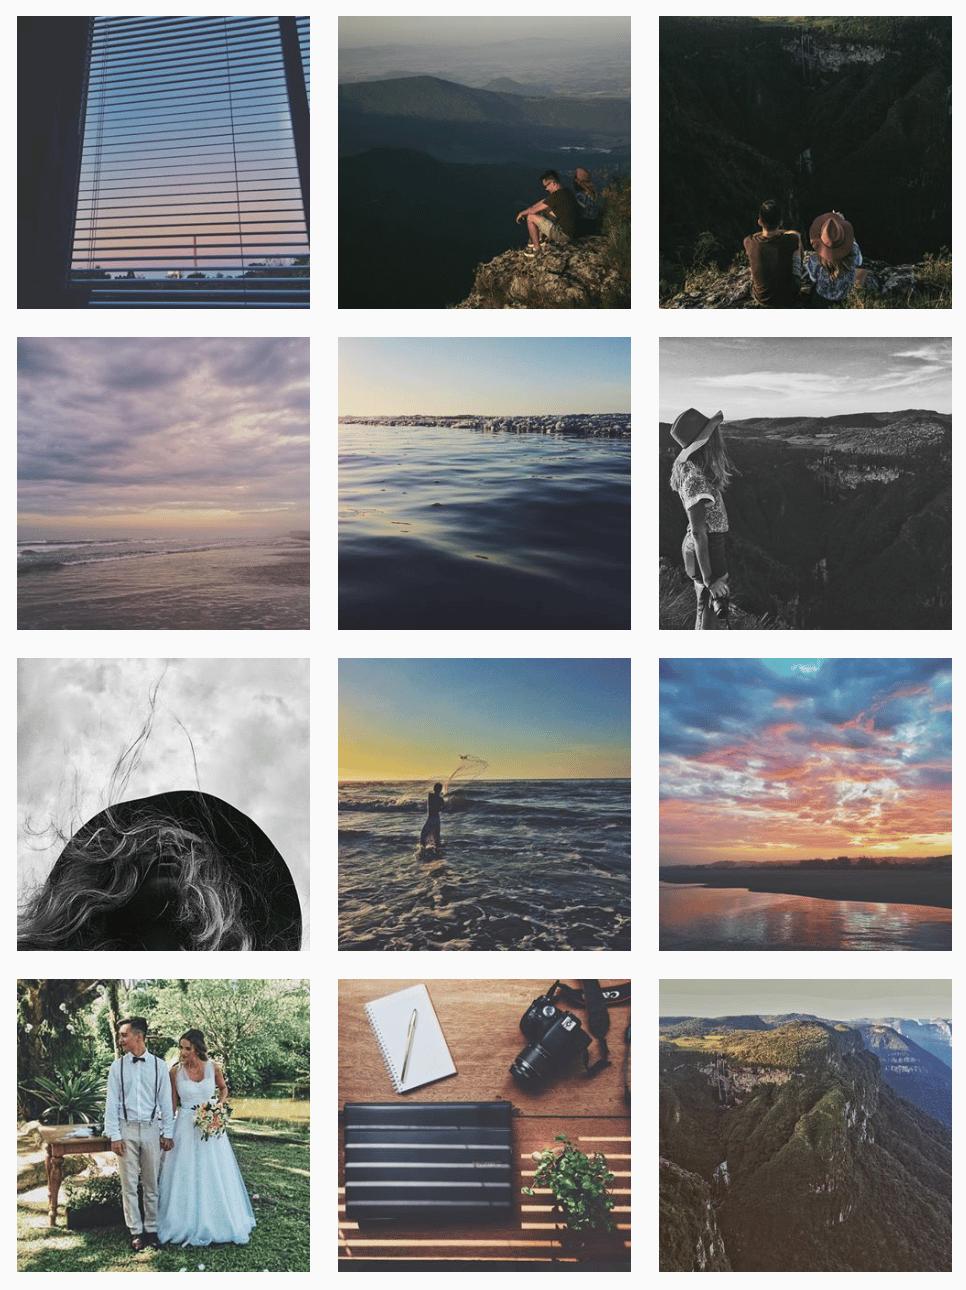 como organizar o feed instagram feed desorganizado